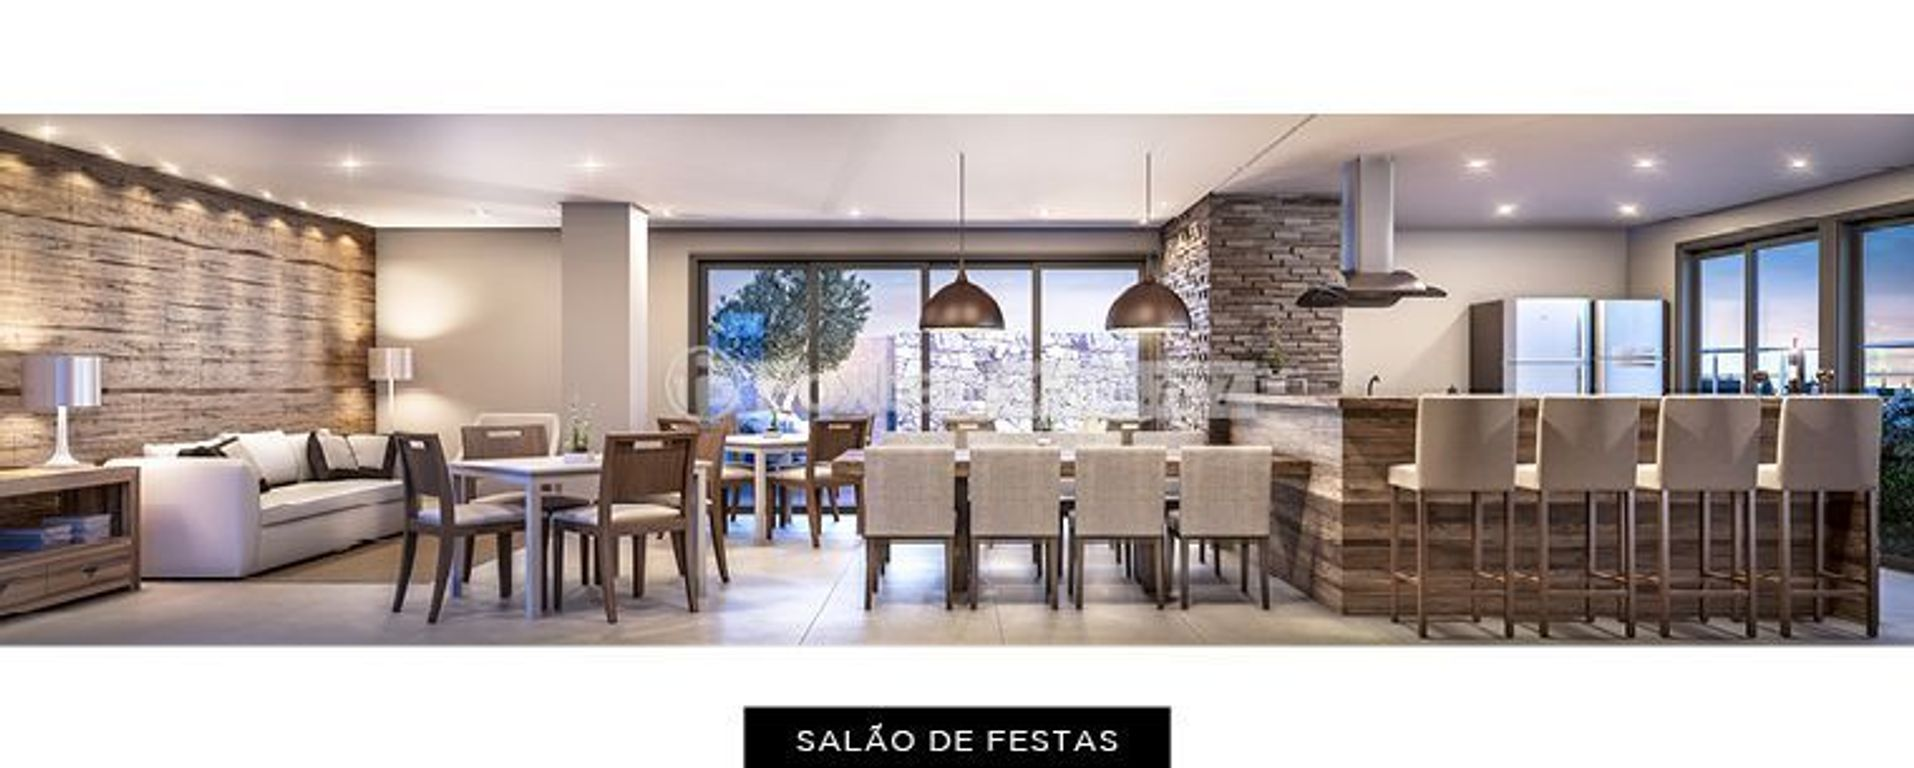 Apto 2 Dorm, Centro, Torres (148668) - Foto 10